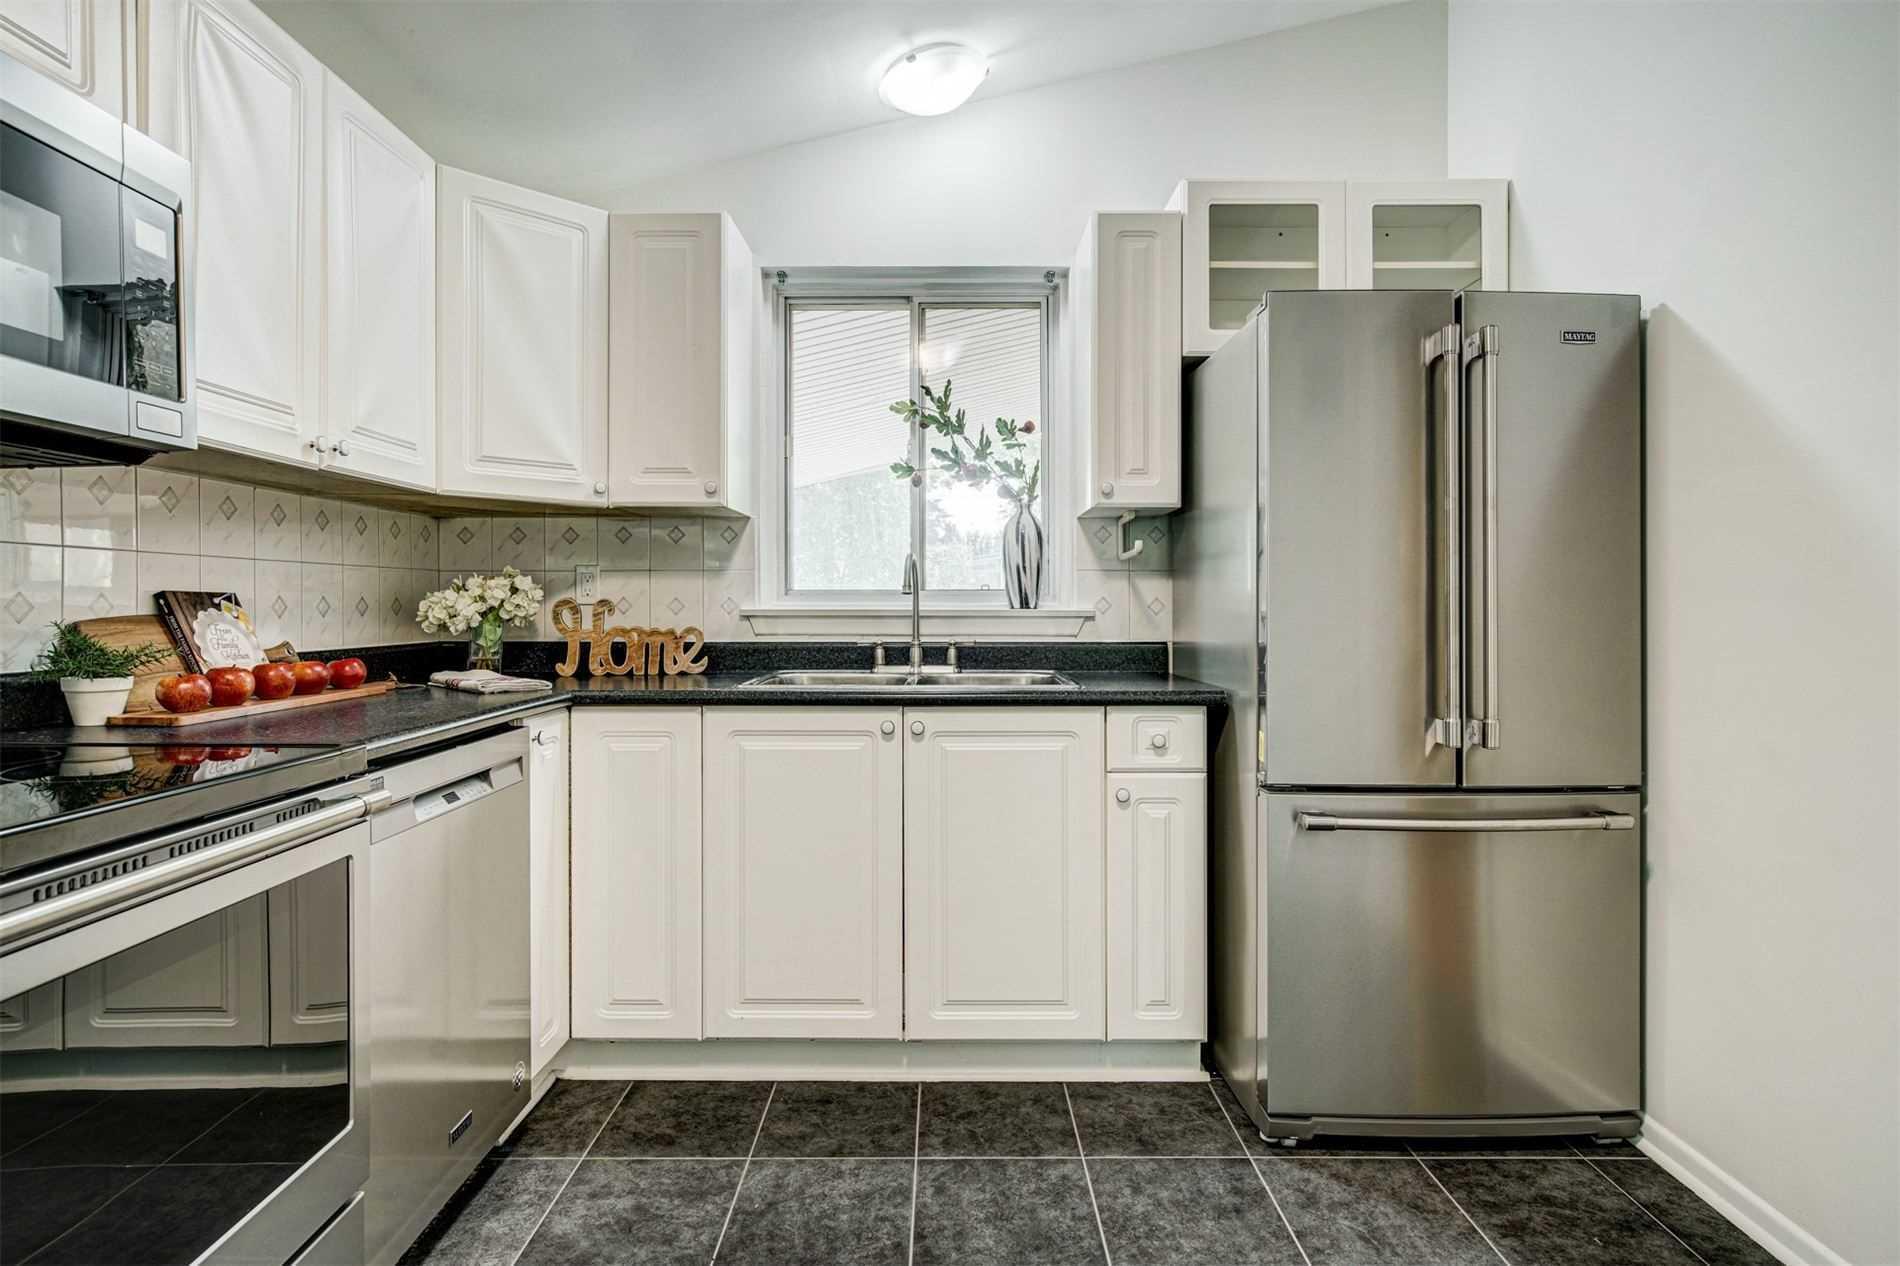 140 Verobeach Blvd - Humbermede Detached for sale, 3 Bedrooms (W5385046) - #13